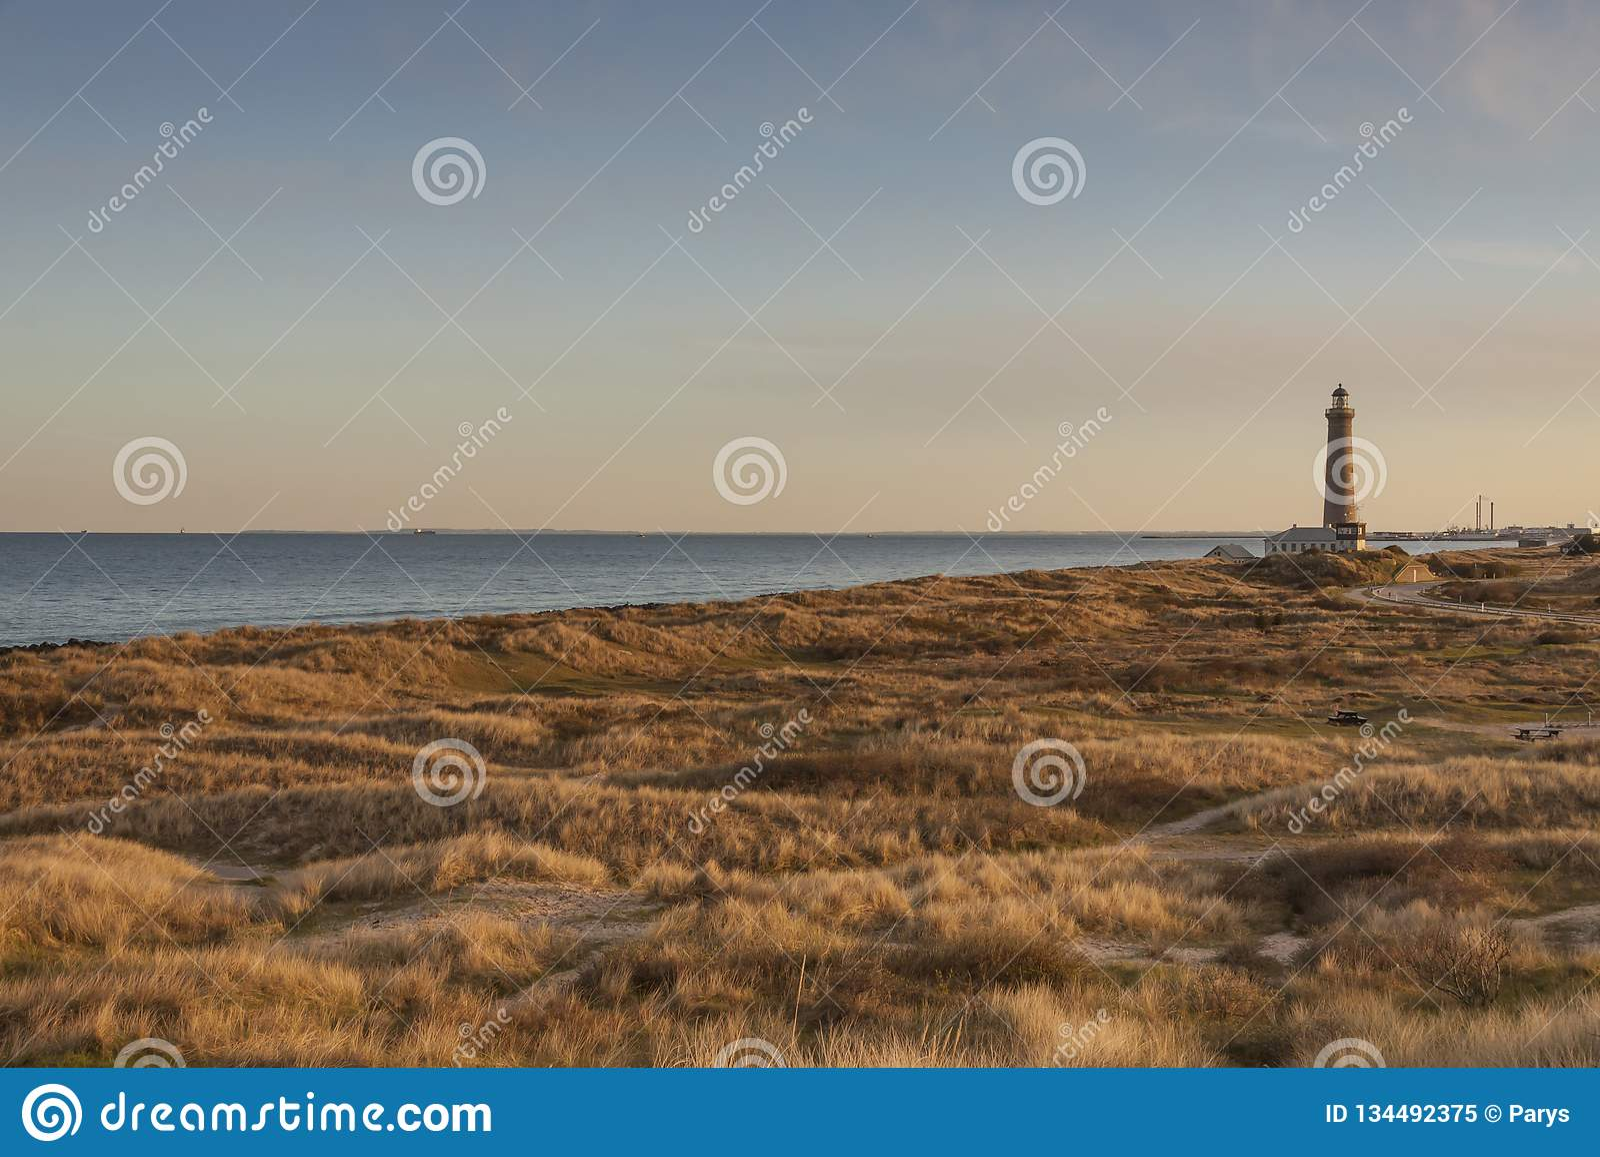 Farol em Skagen em Dinamarca